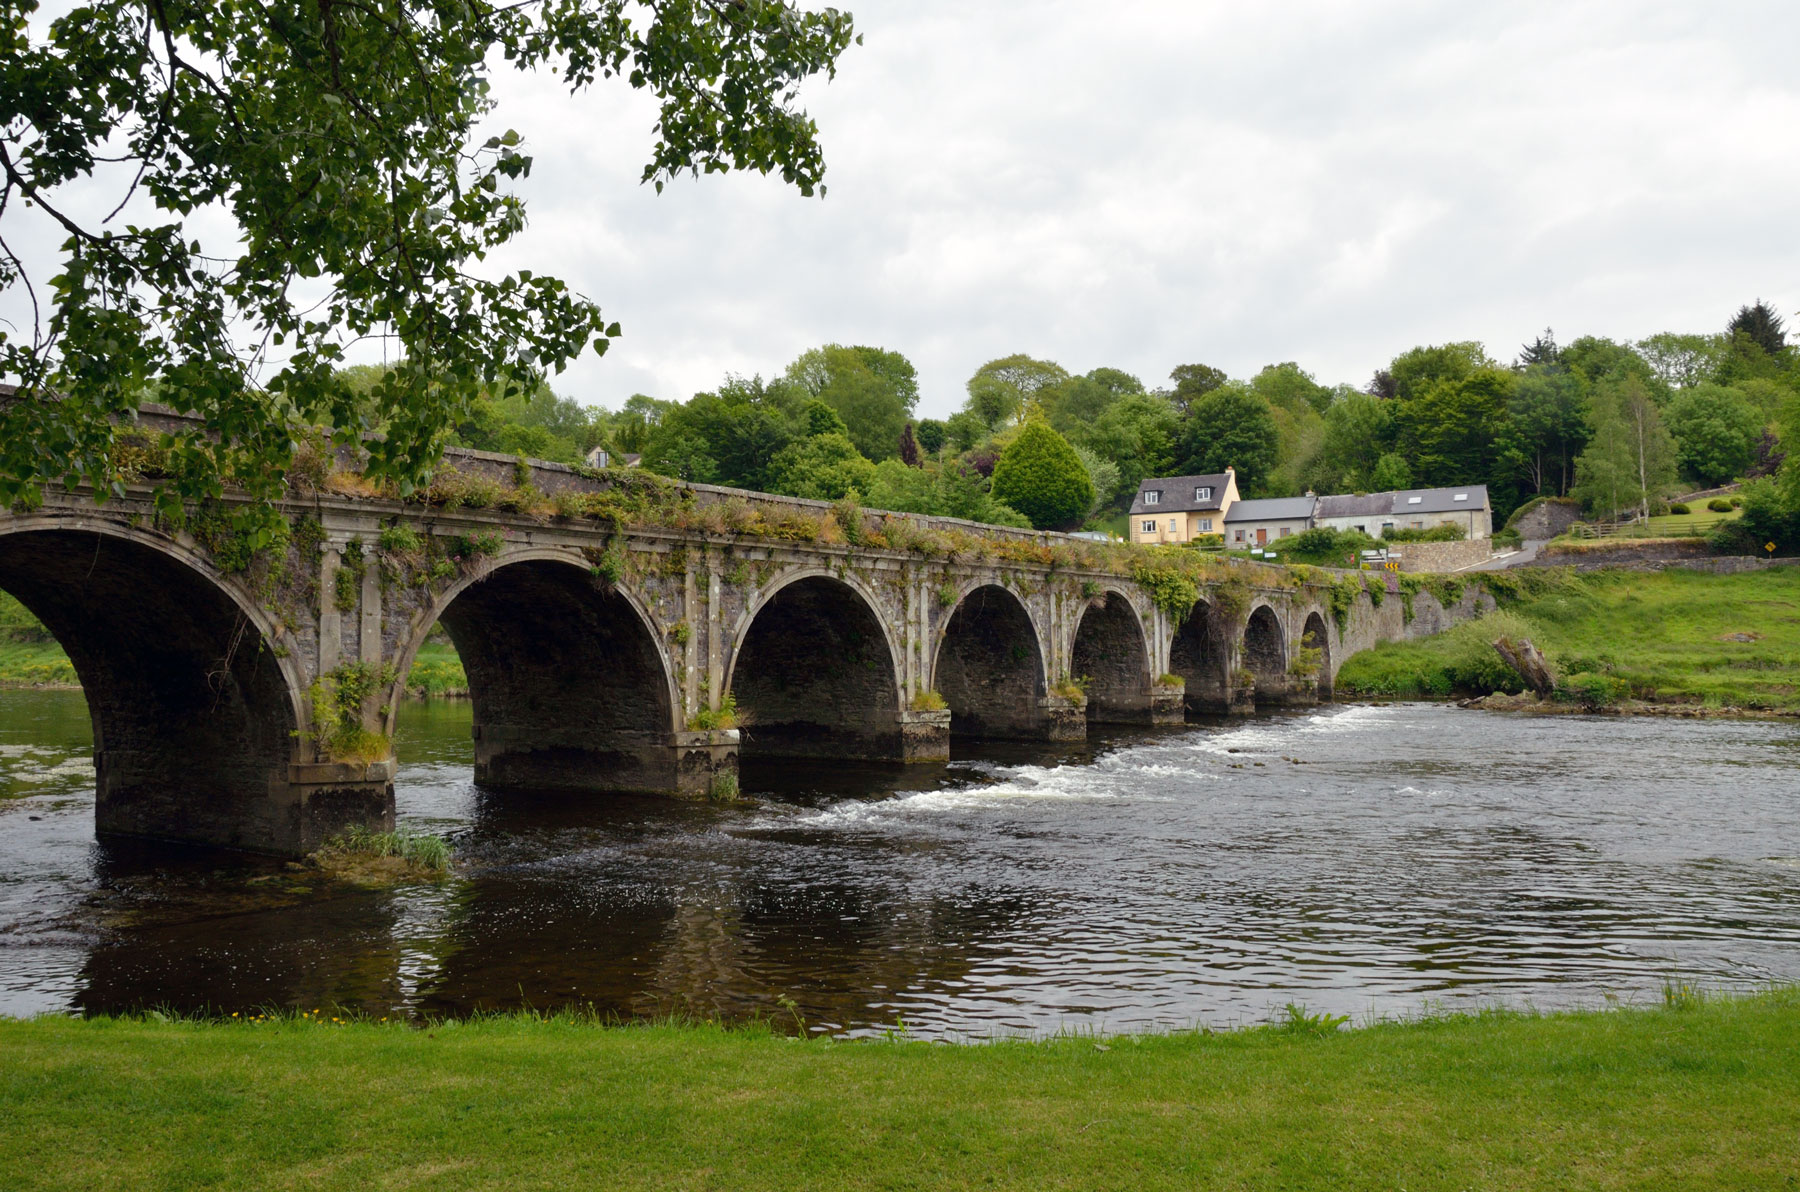 Bridge over river in Irish midlands